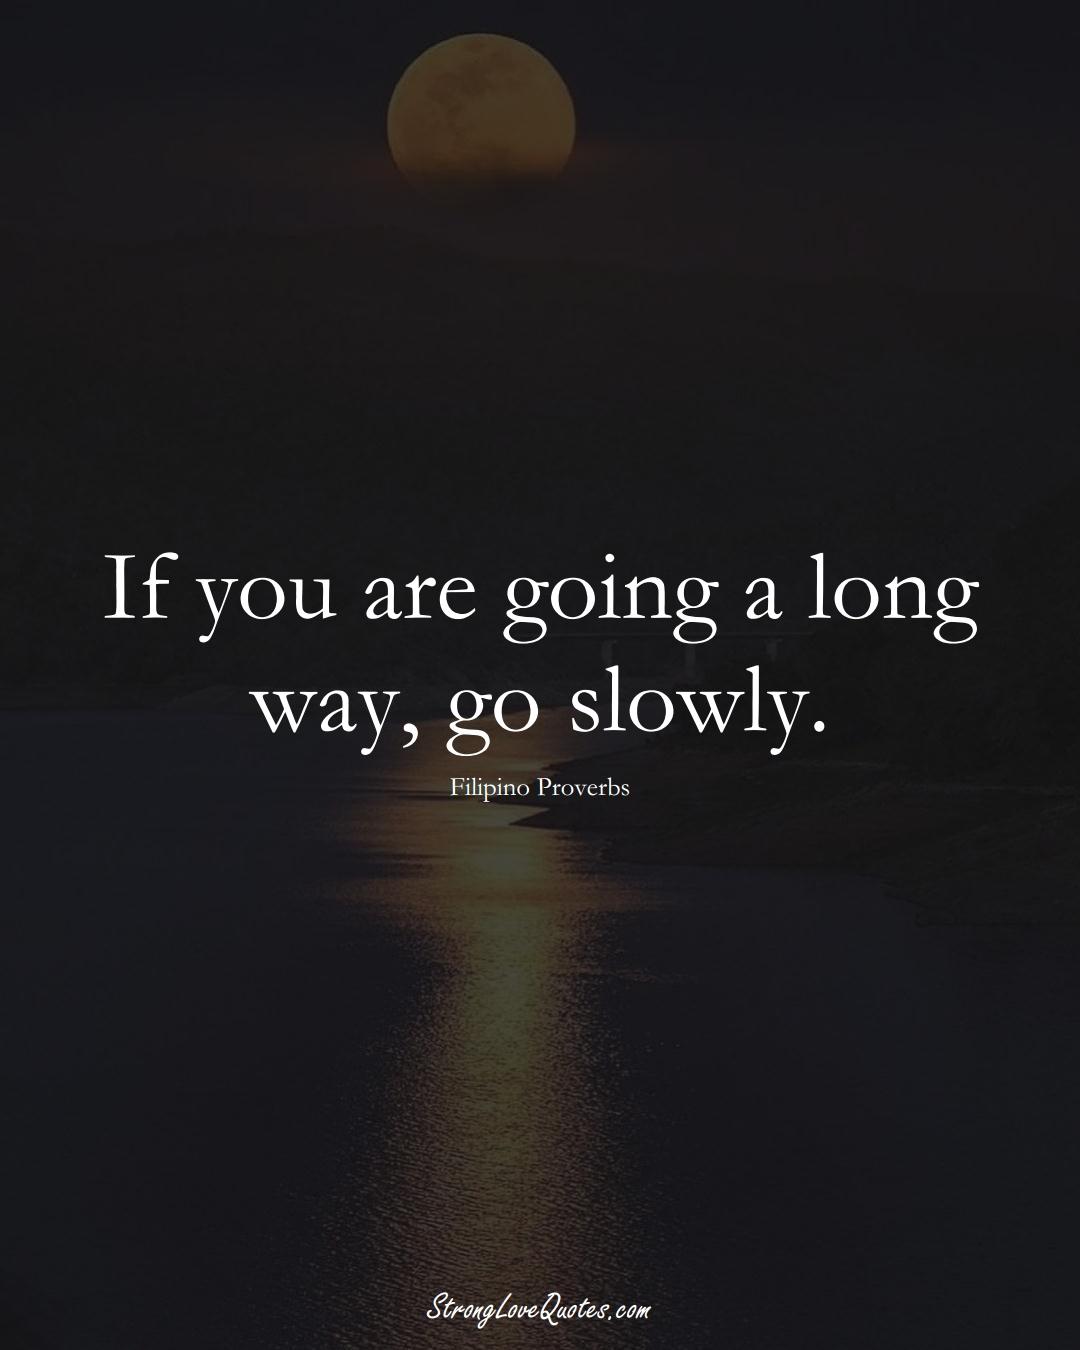 If you are going a long way, go slowly. (Filipino Sayings);  #AsianSayings